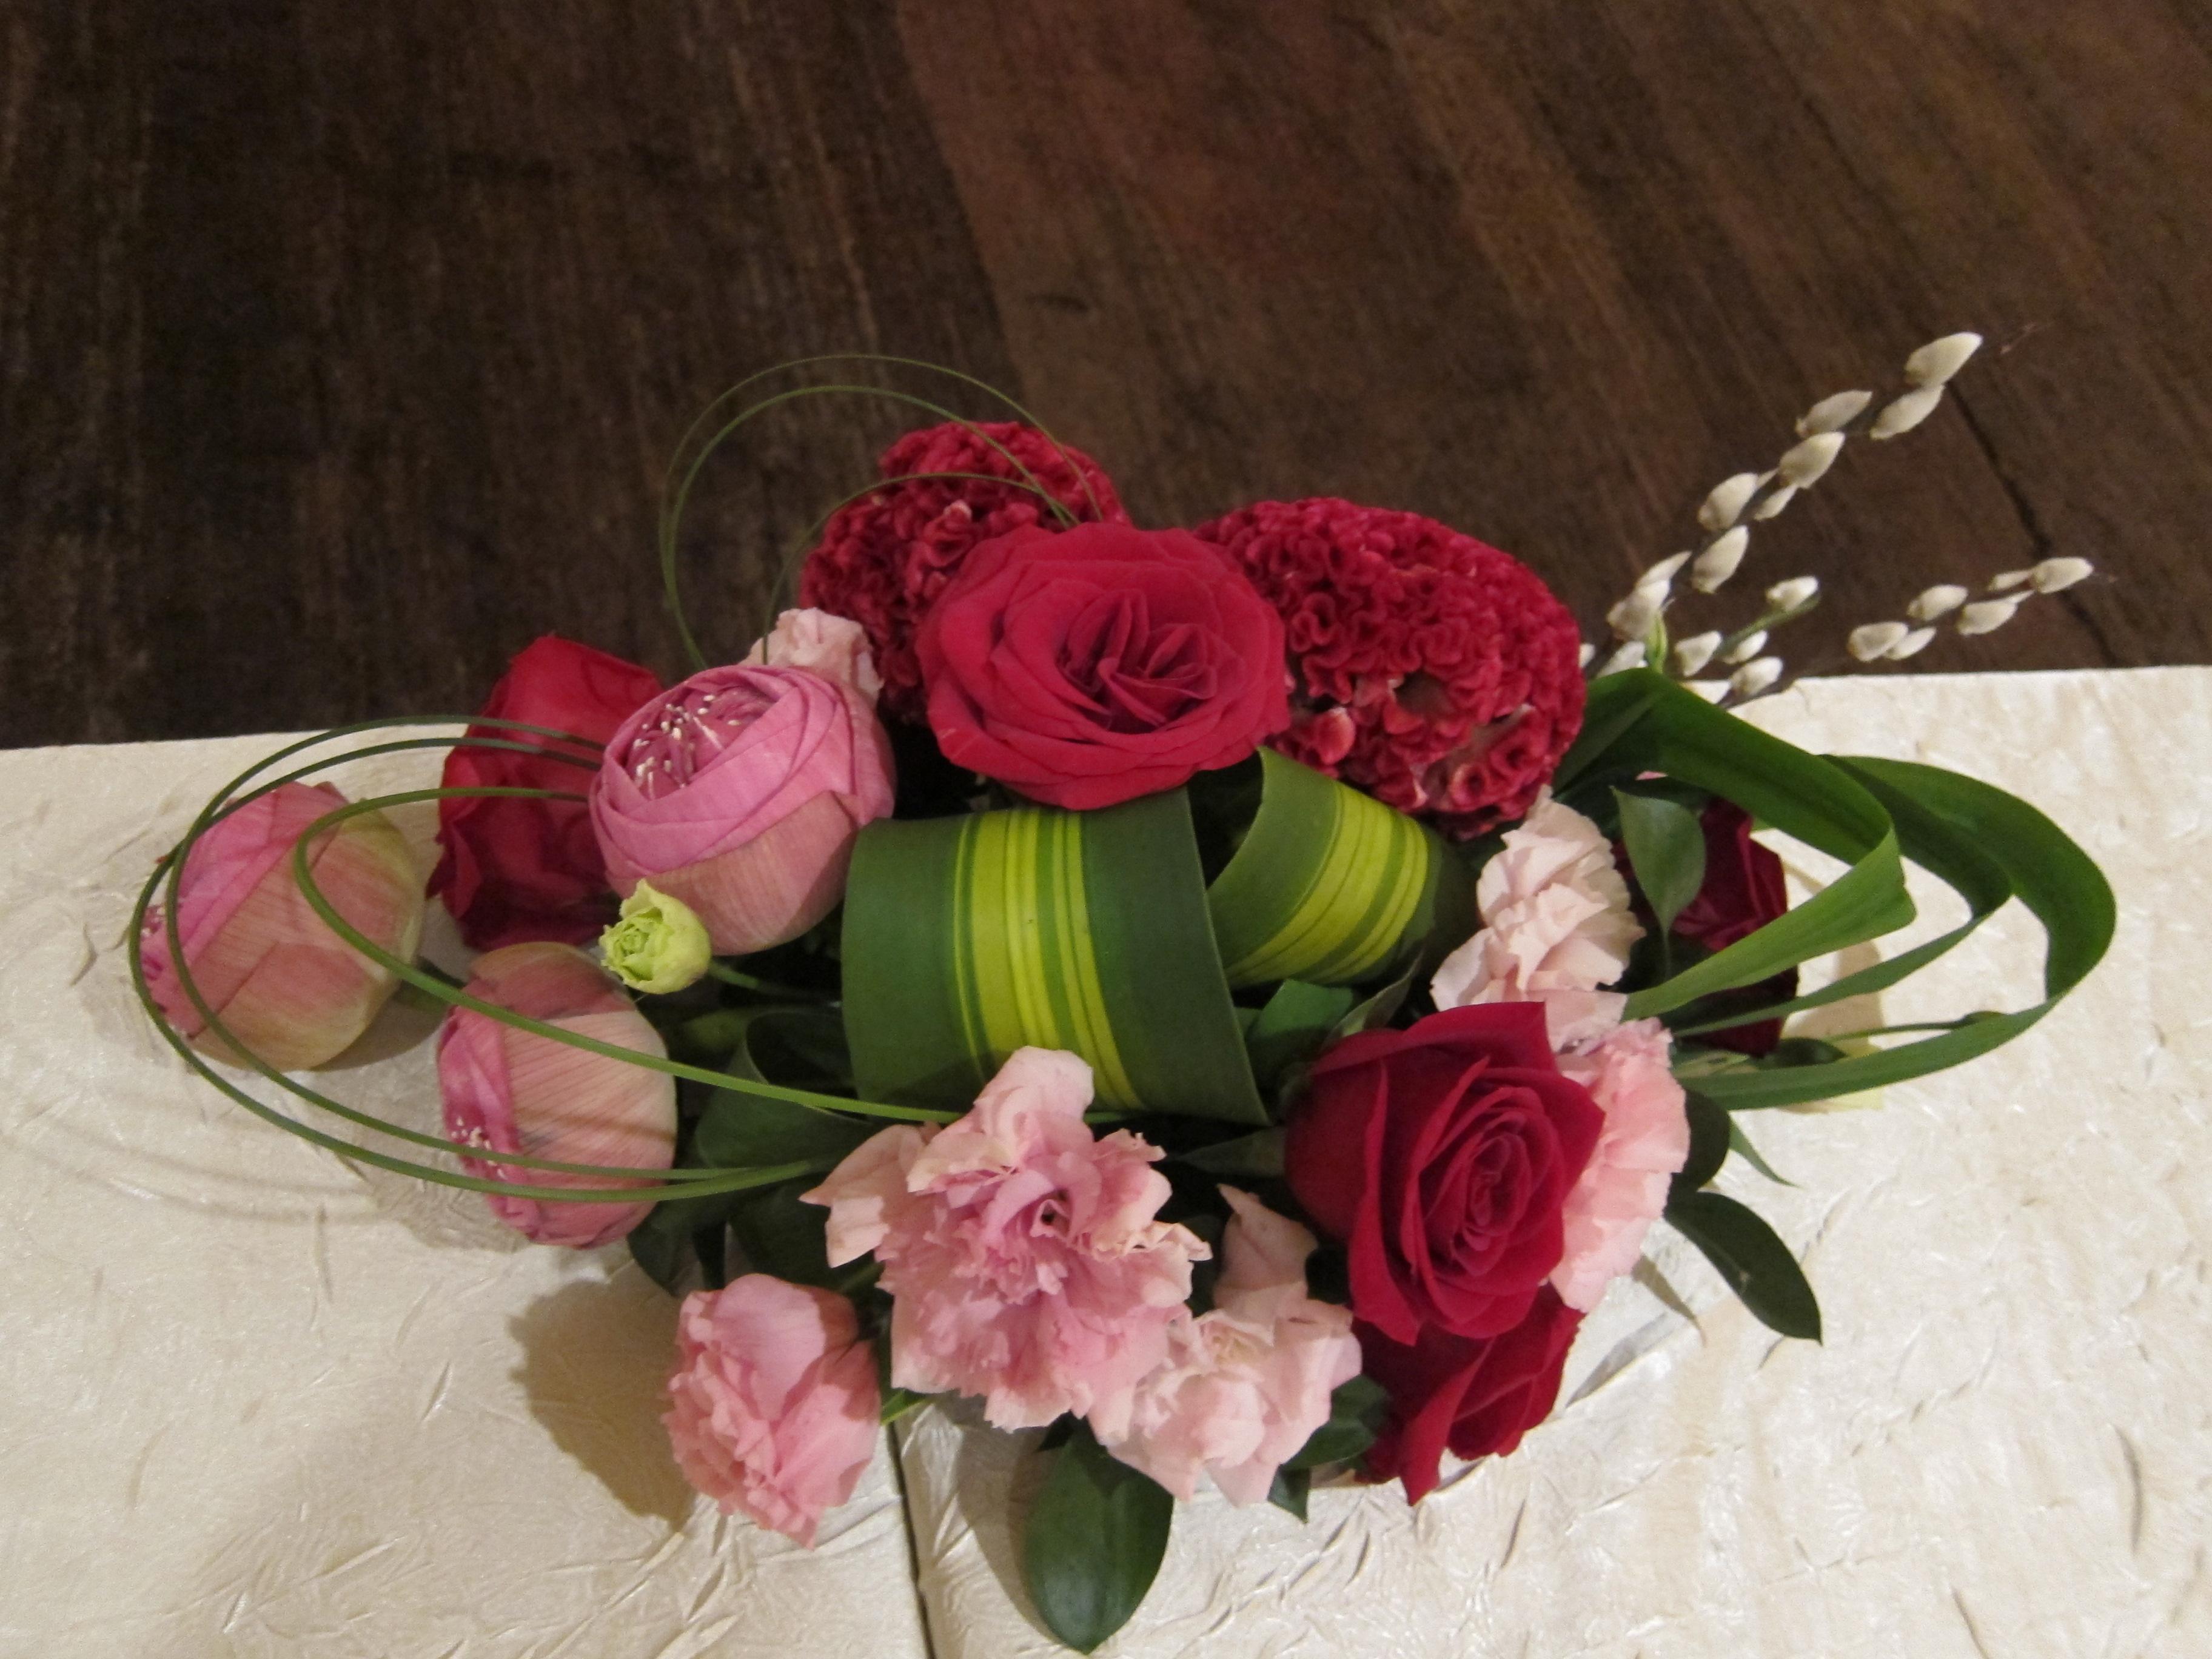 Lotus Flower Nelumbo Nucifera In This World But Not Of This World